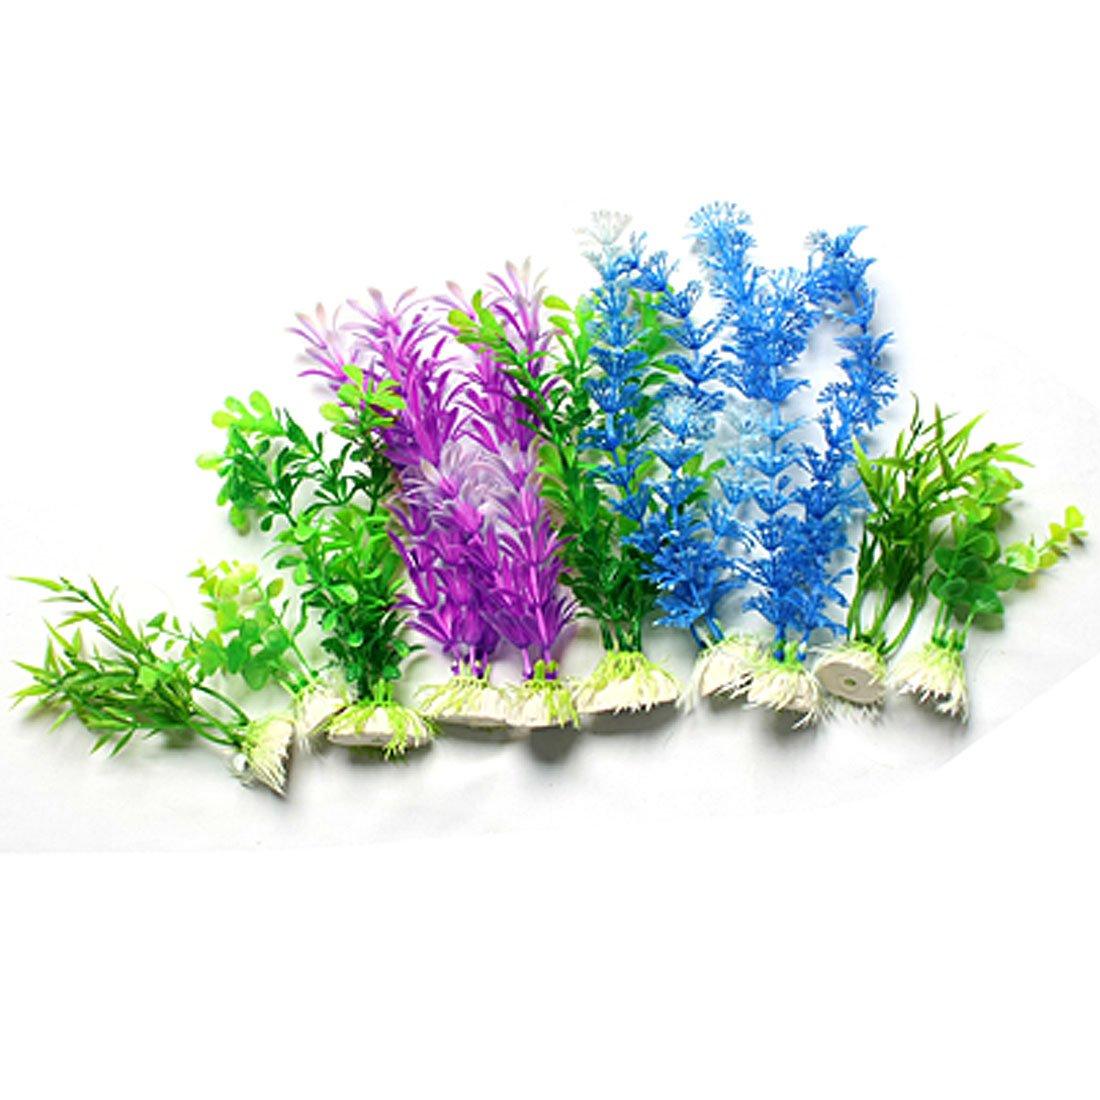 10 stueck lila blau gruen mischfarbe gras aquarium. Black Bedroom Furniture Sets. Home Design Ideas